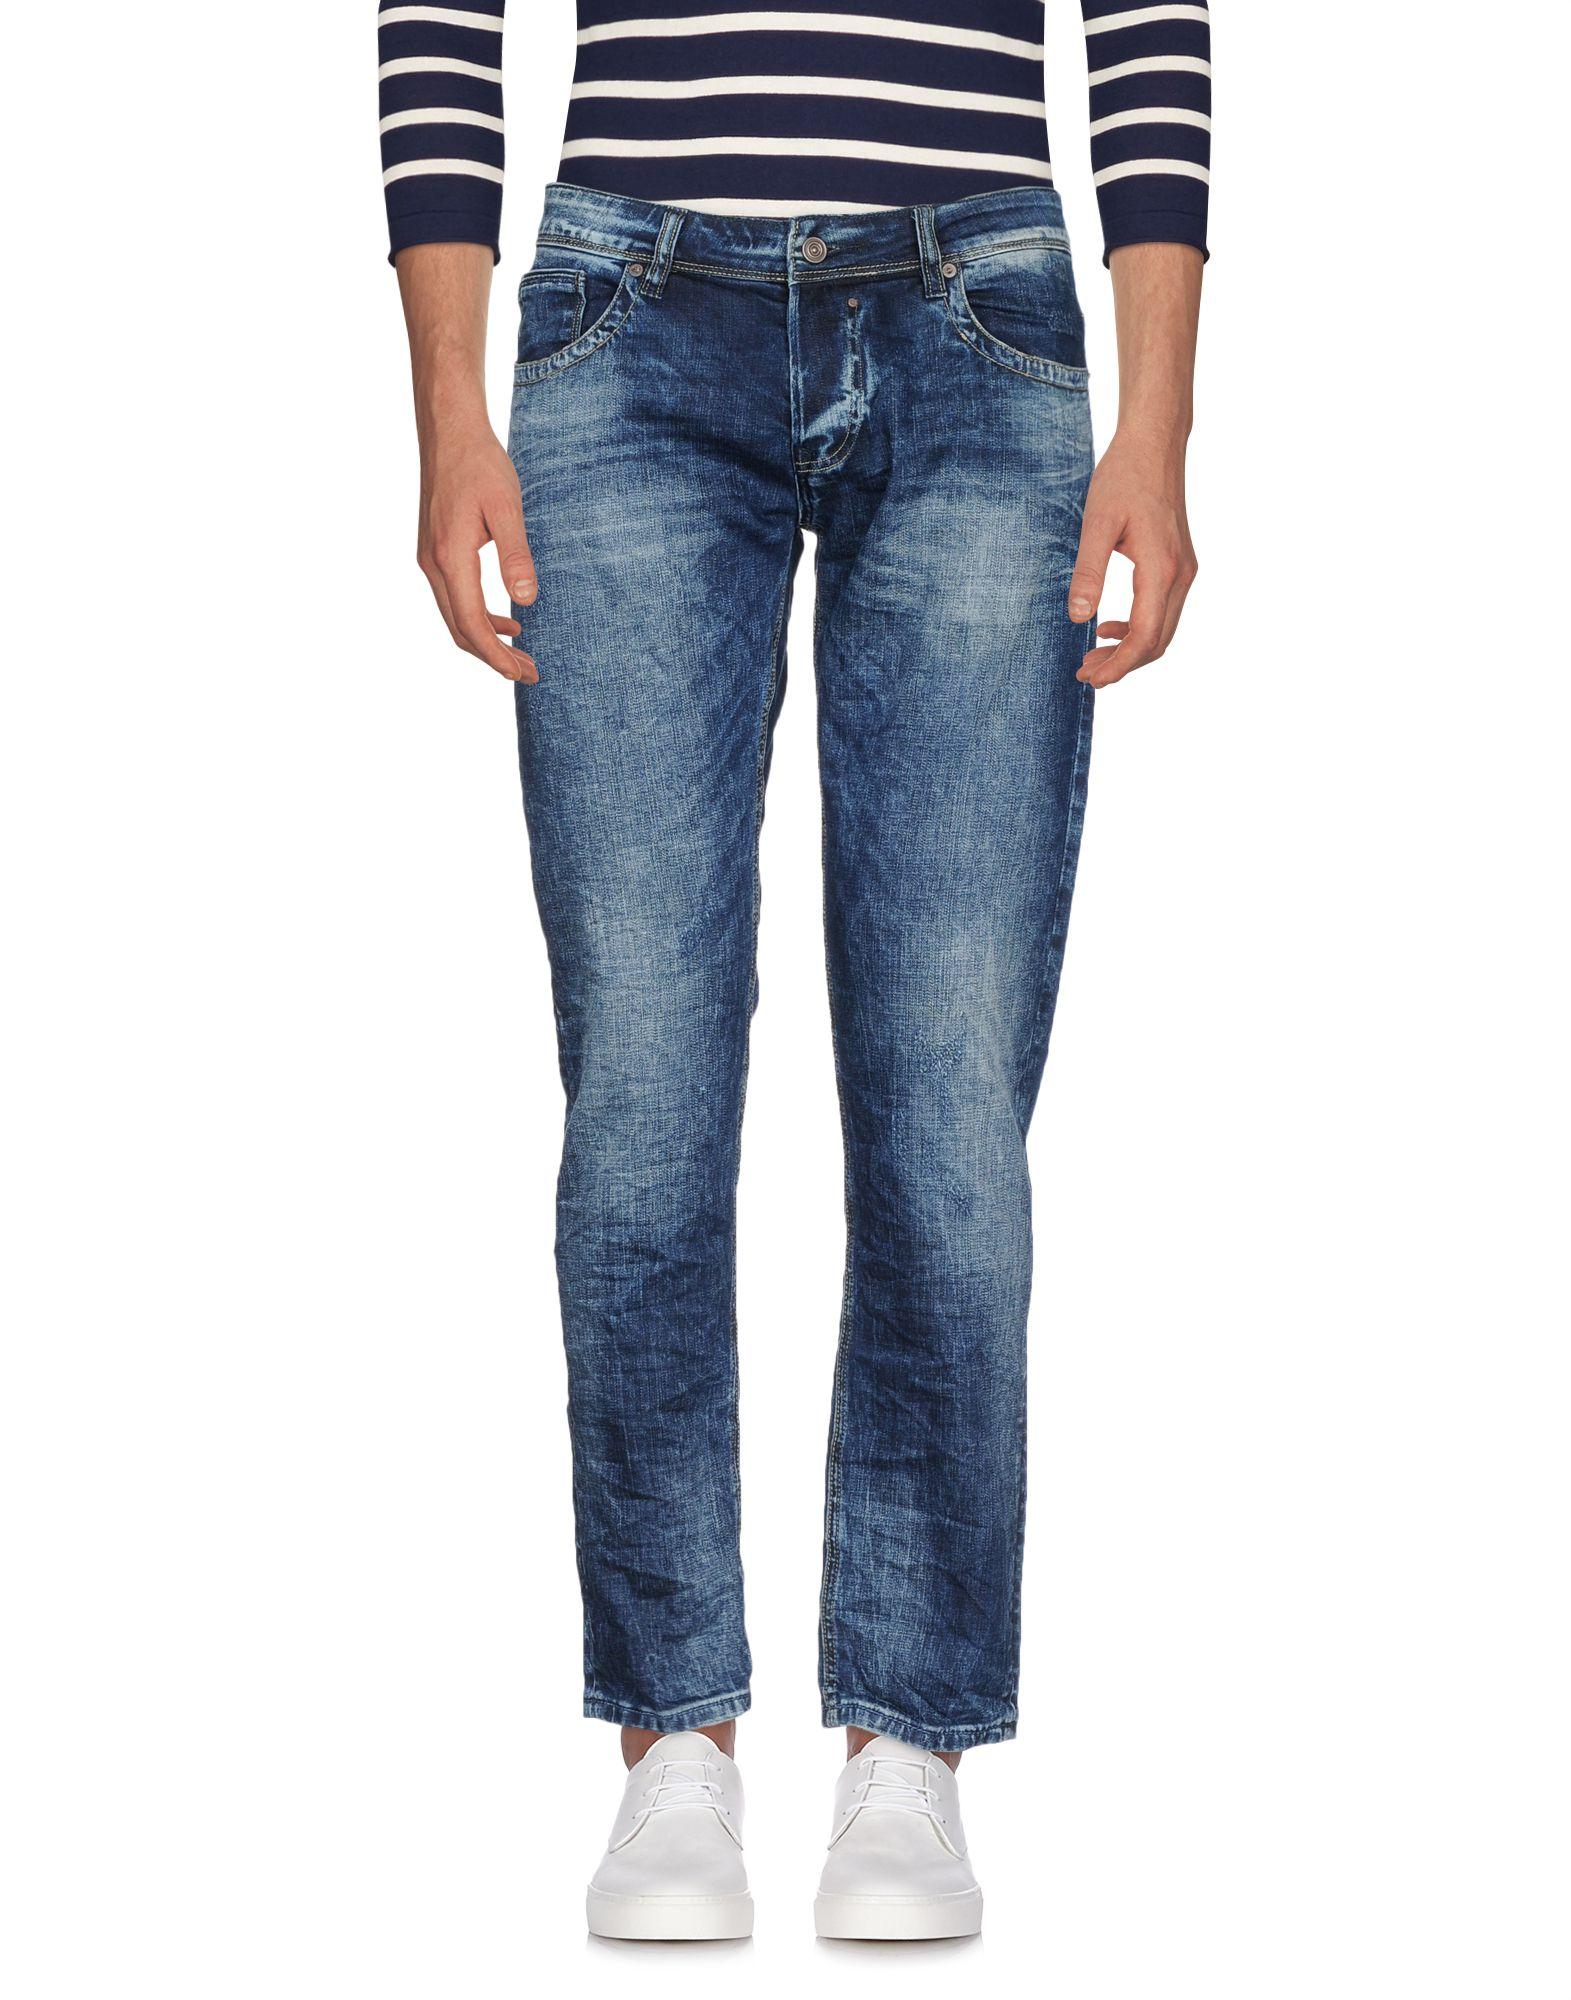 GIANNI LUPO Herren Jeanshose Farbe Blau Größe 4